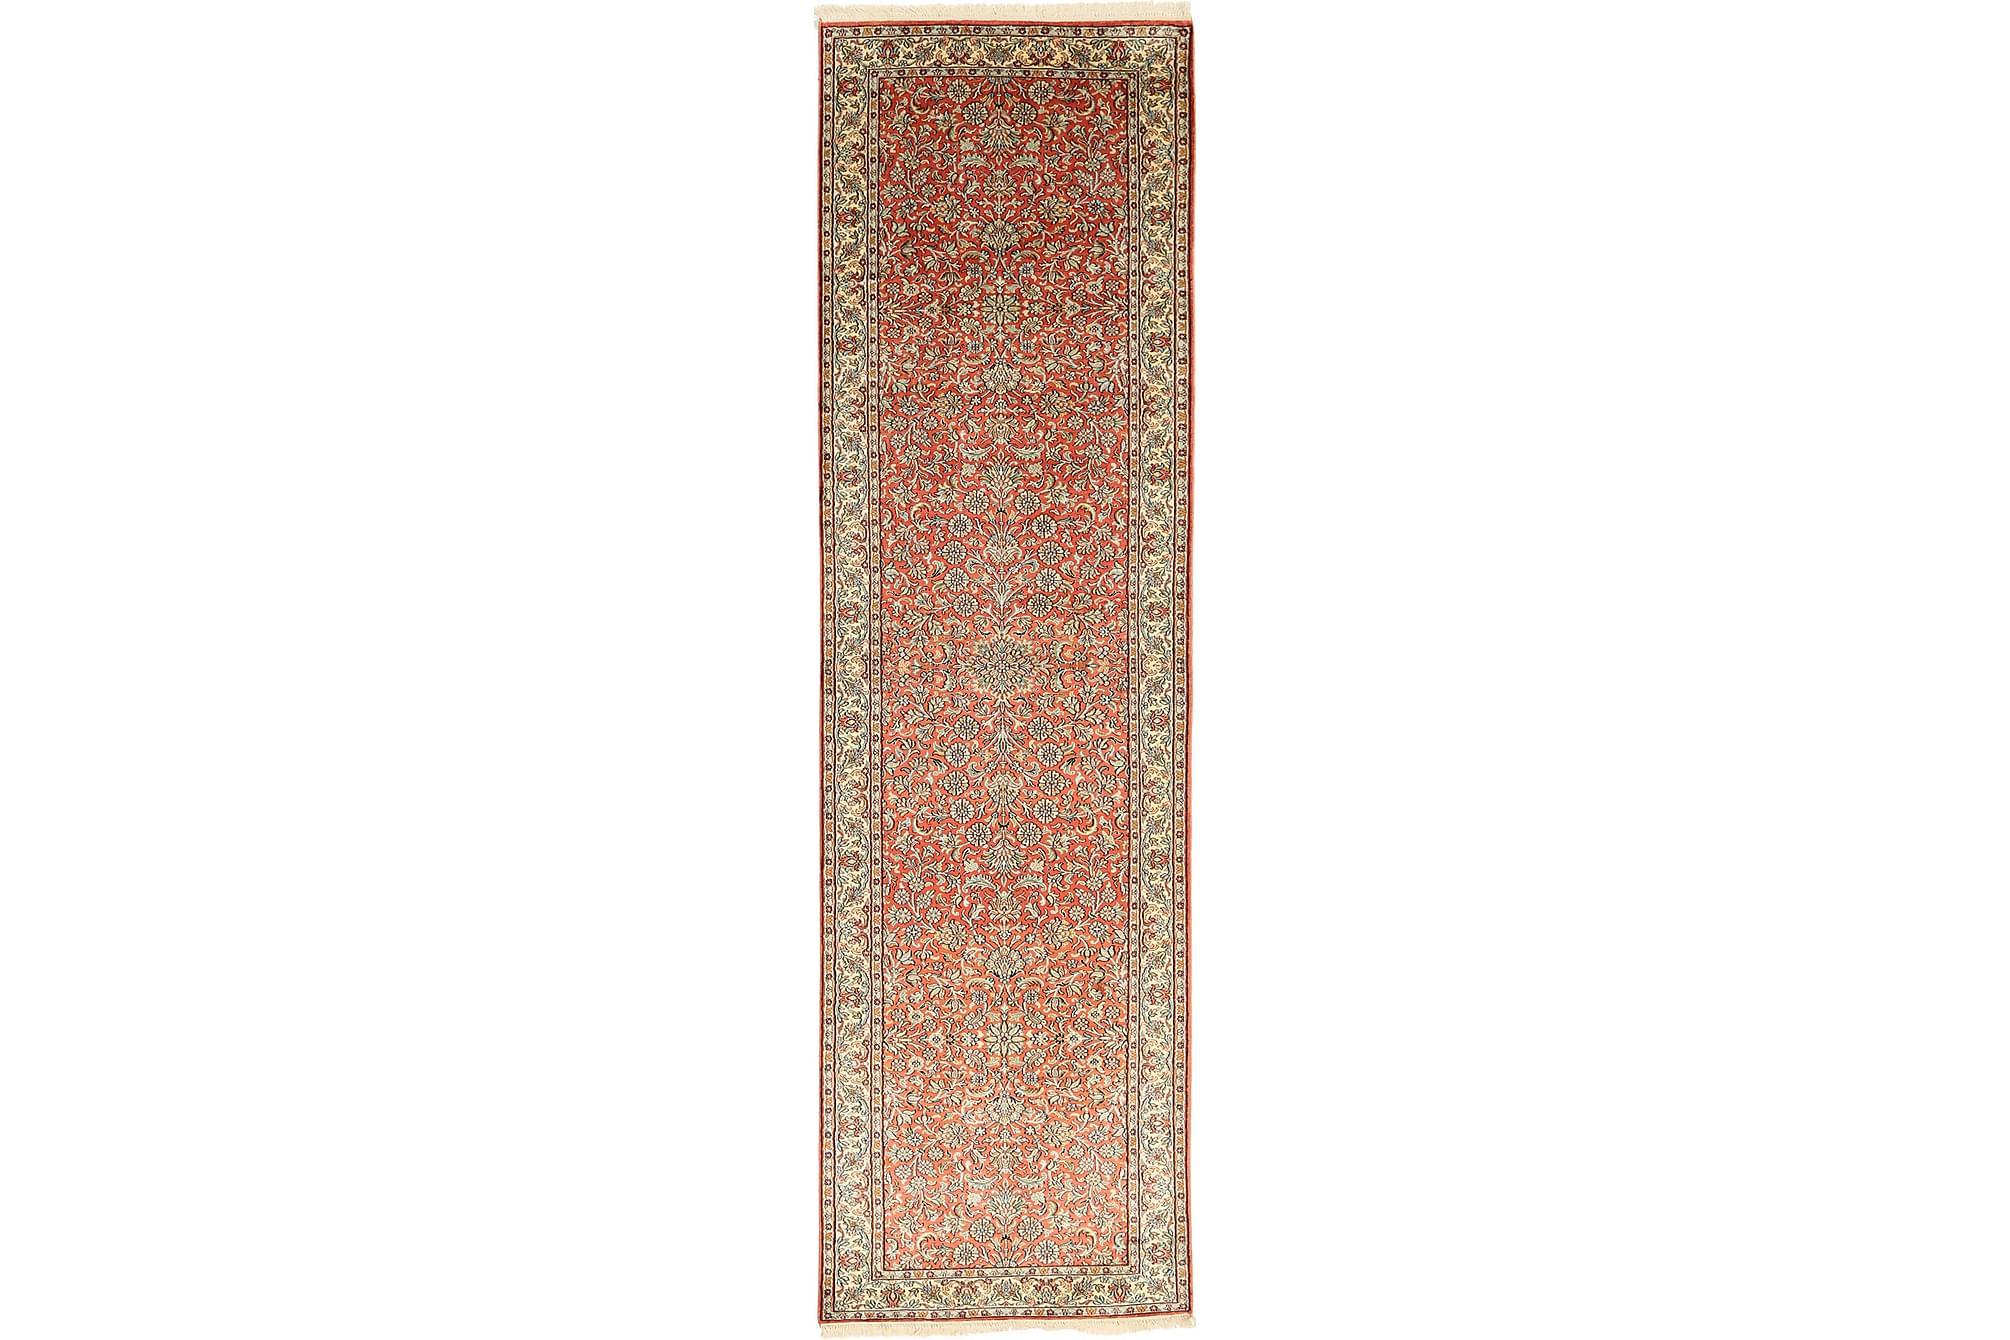 KASHMIR äkta silke matta 80x302 Orientalisk, Avlång Matta, Äkta silkesmattor